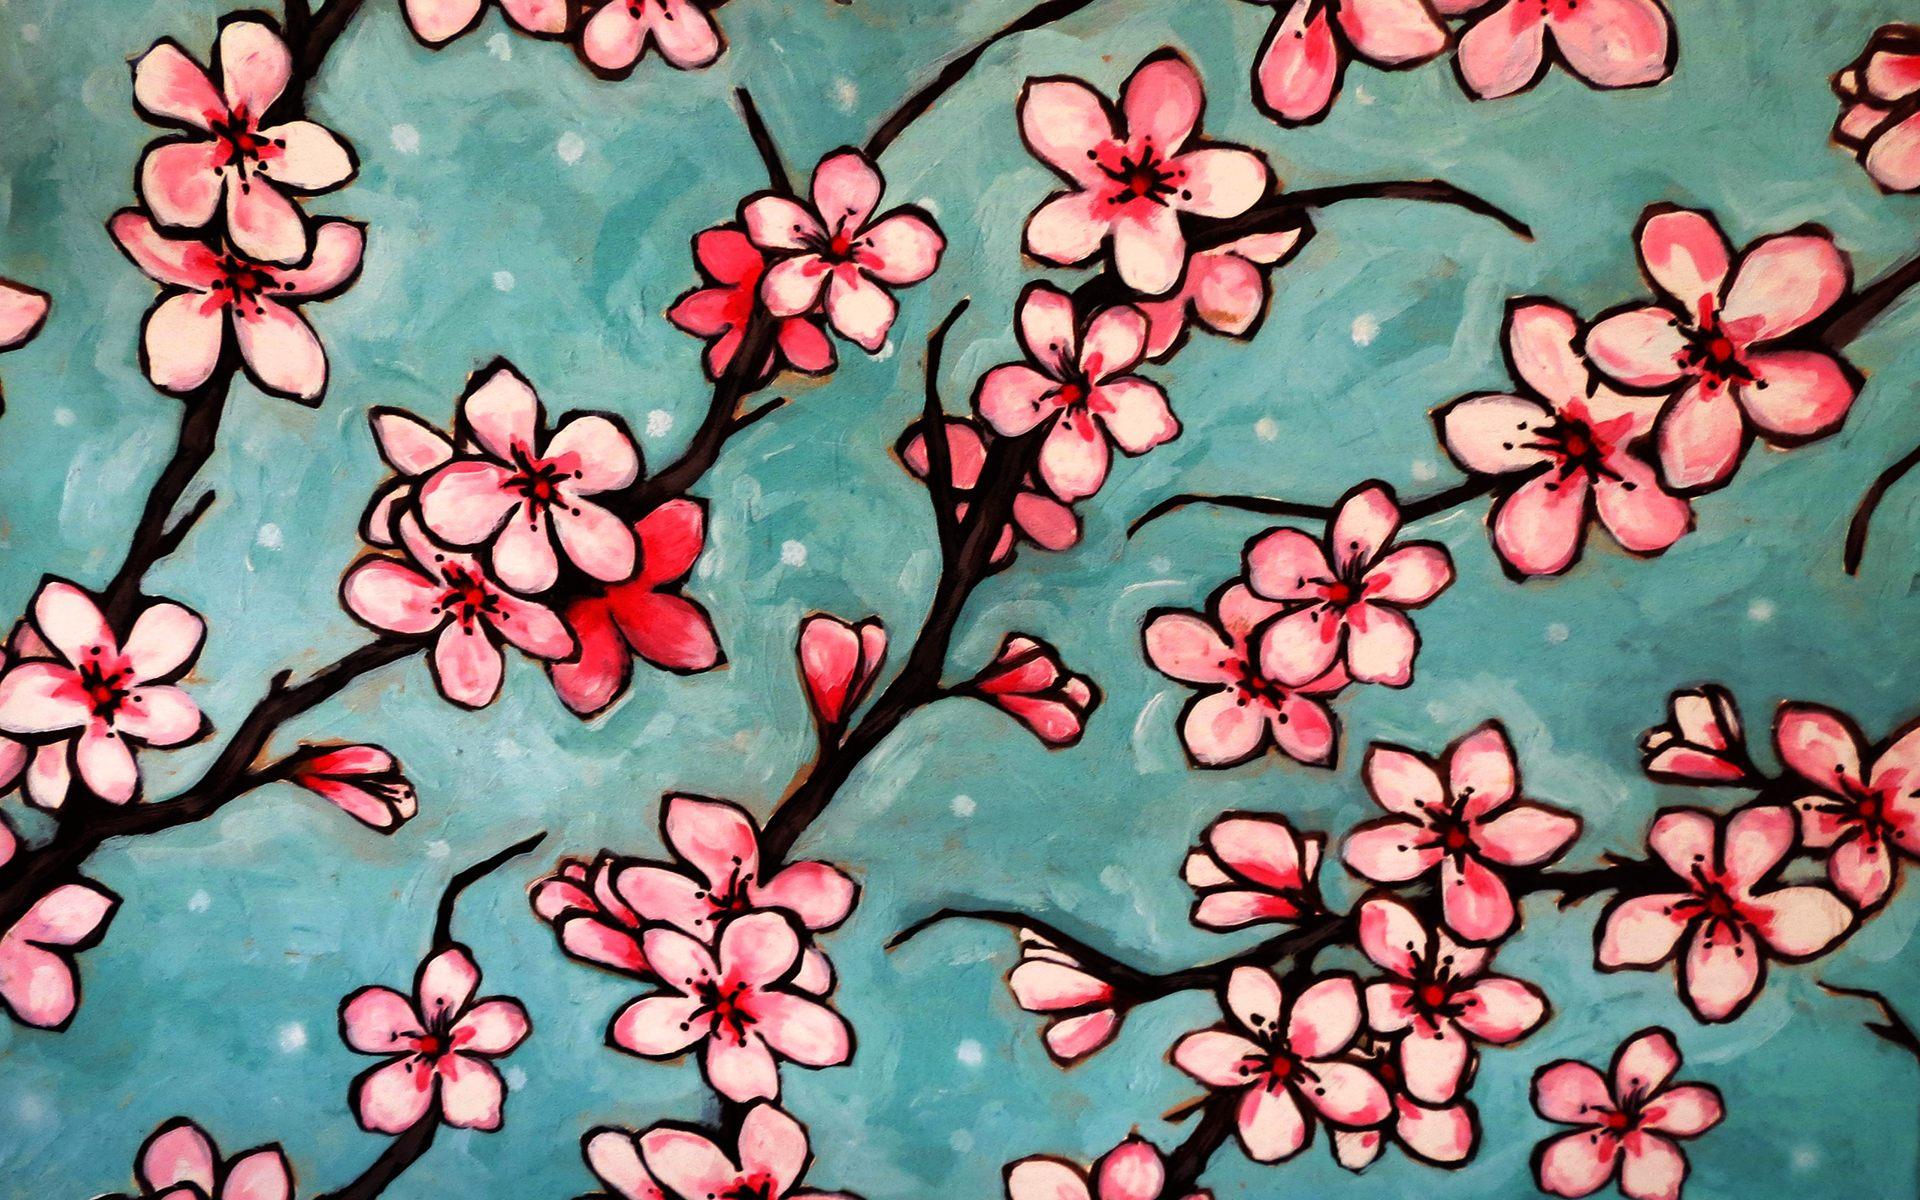 Drawn background hd wallpaper #9